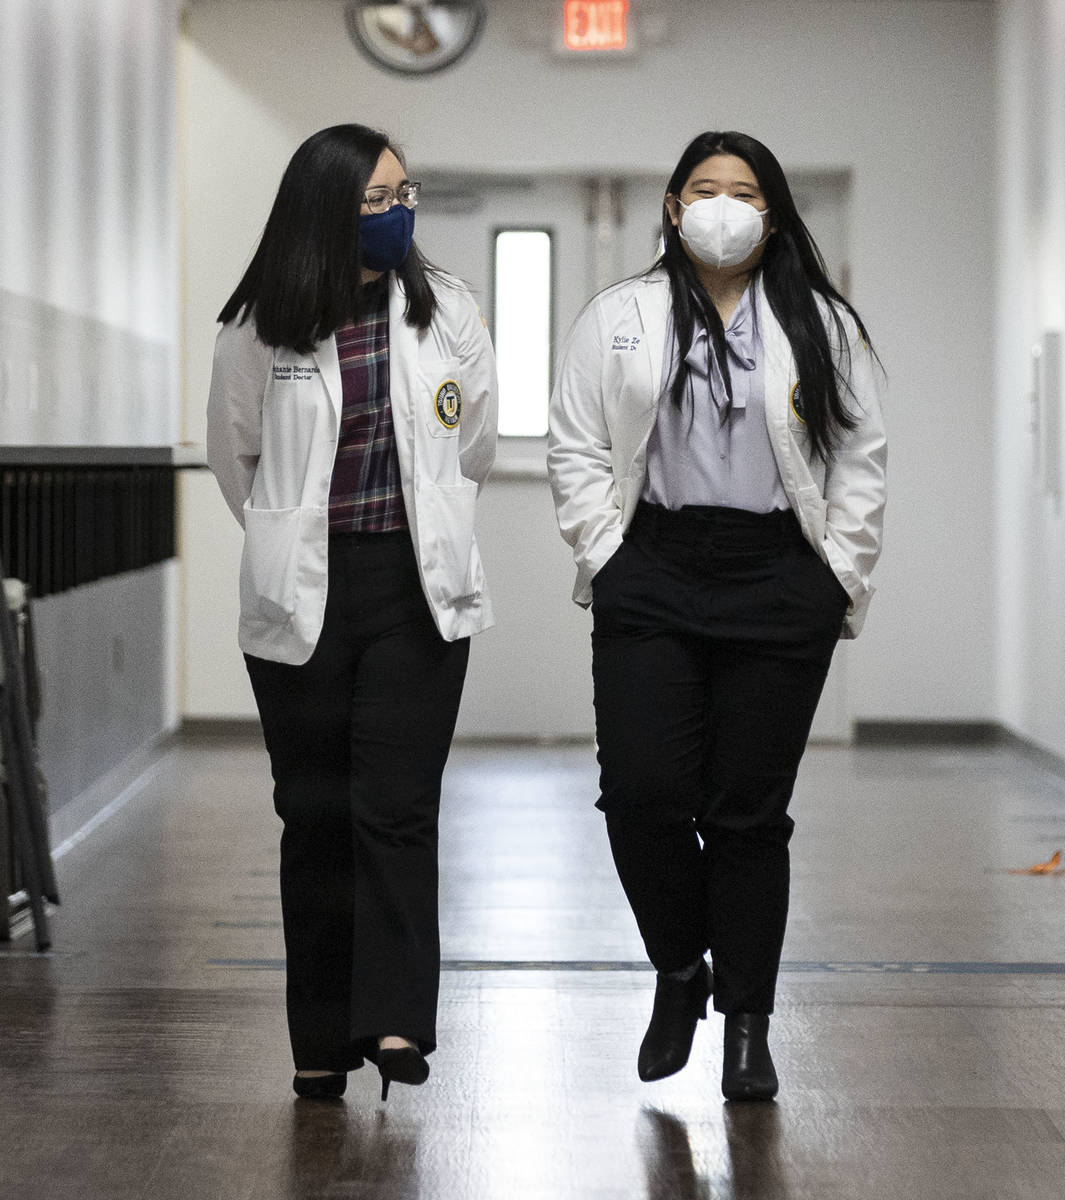 Toro University Nevada students, Stephanie Bernardo, left, and Kylie Zeng walk at their school, ...